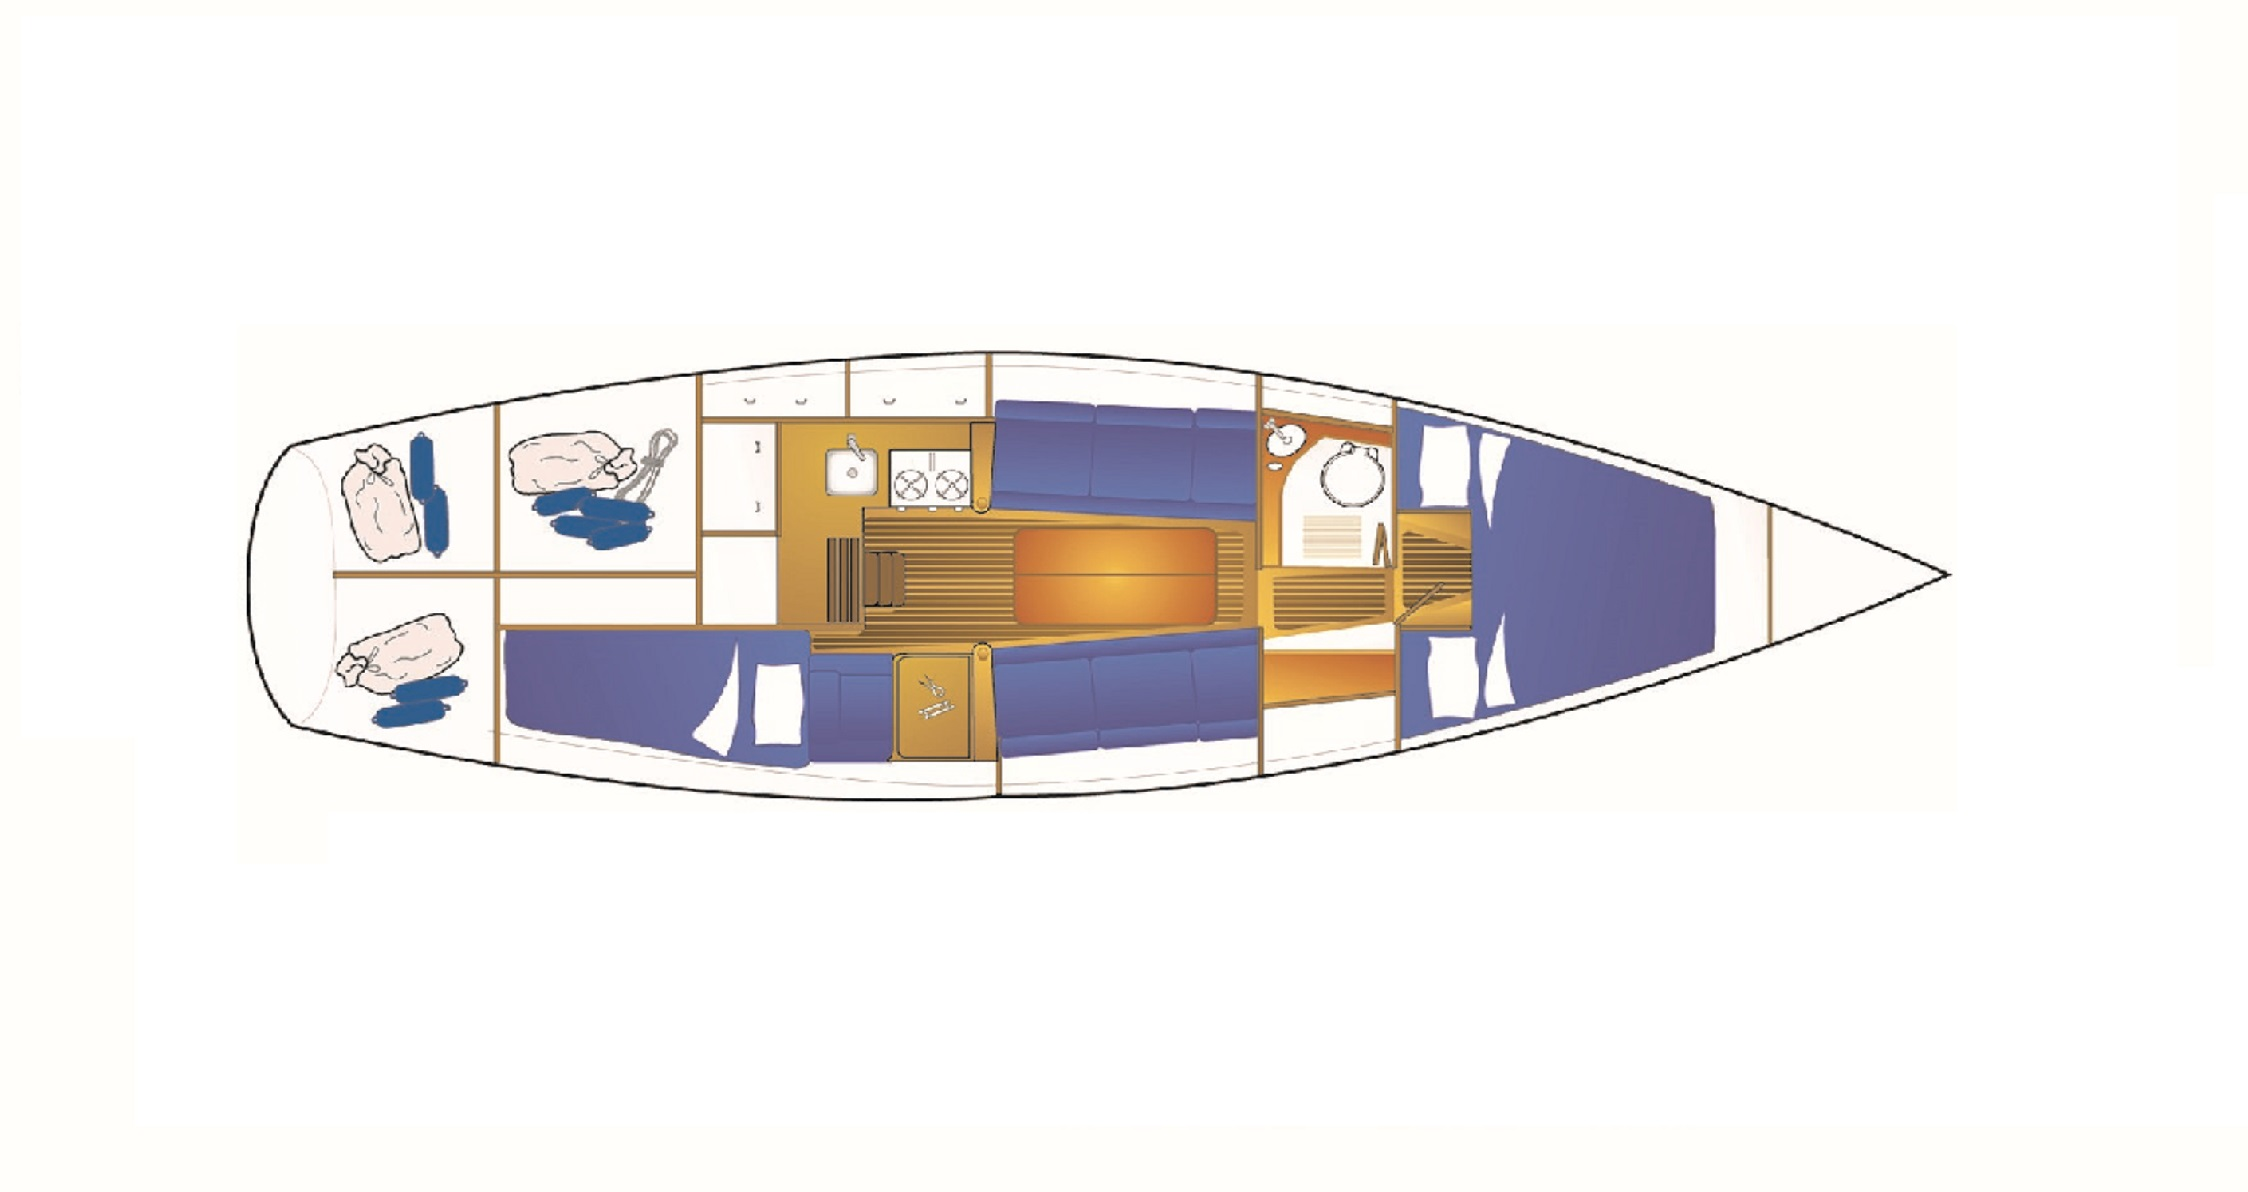 mystery35-Interieur-Plan